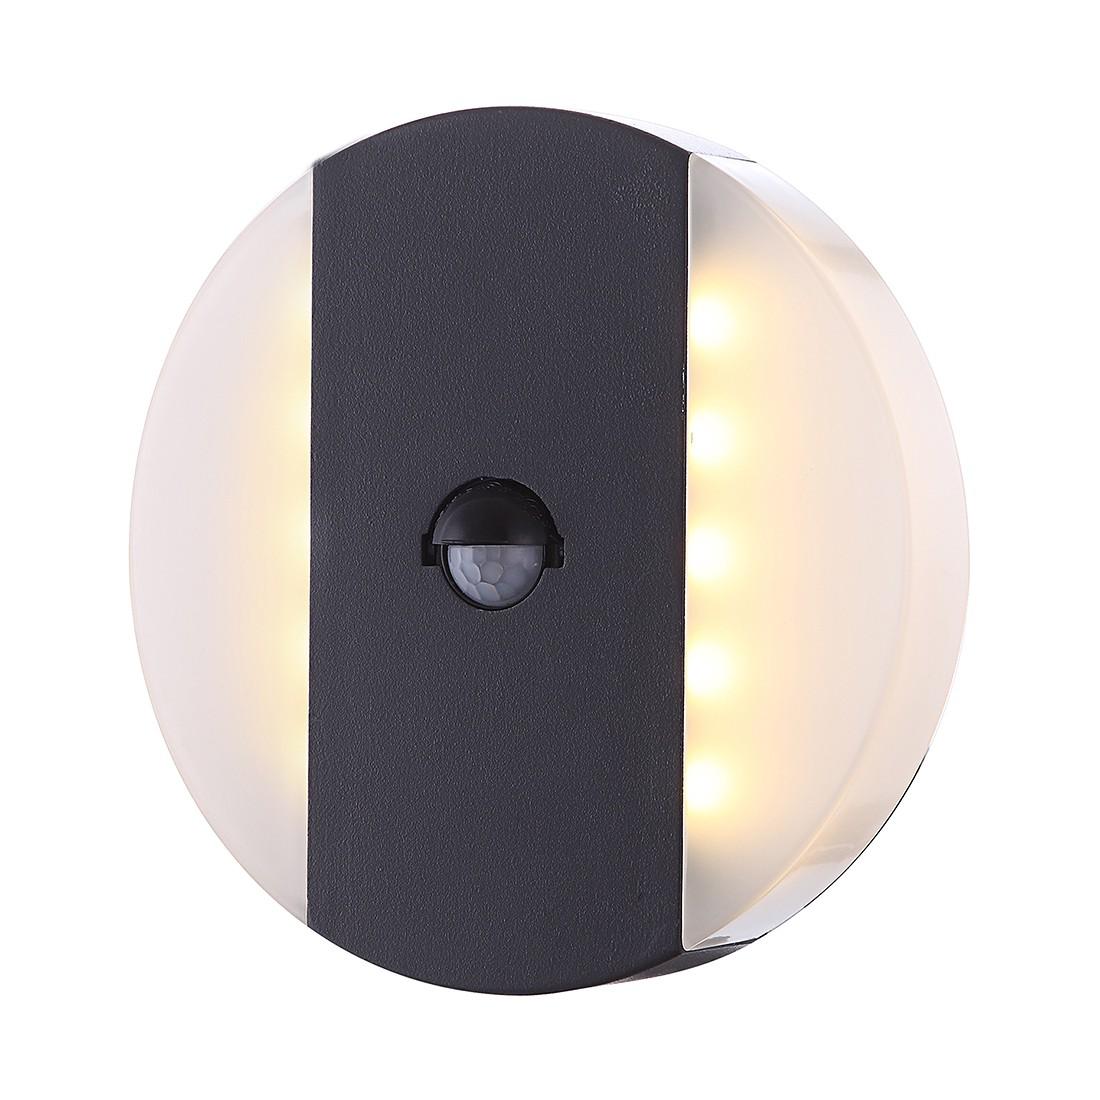 LED-Außenleuchte Moonlight by Globo ● Aluminium/Kunststoff ● Silber- Globo Lighting A+